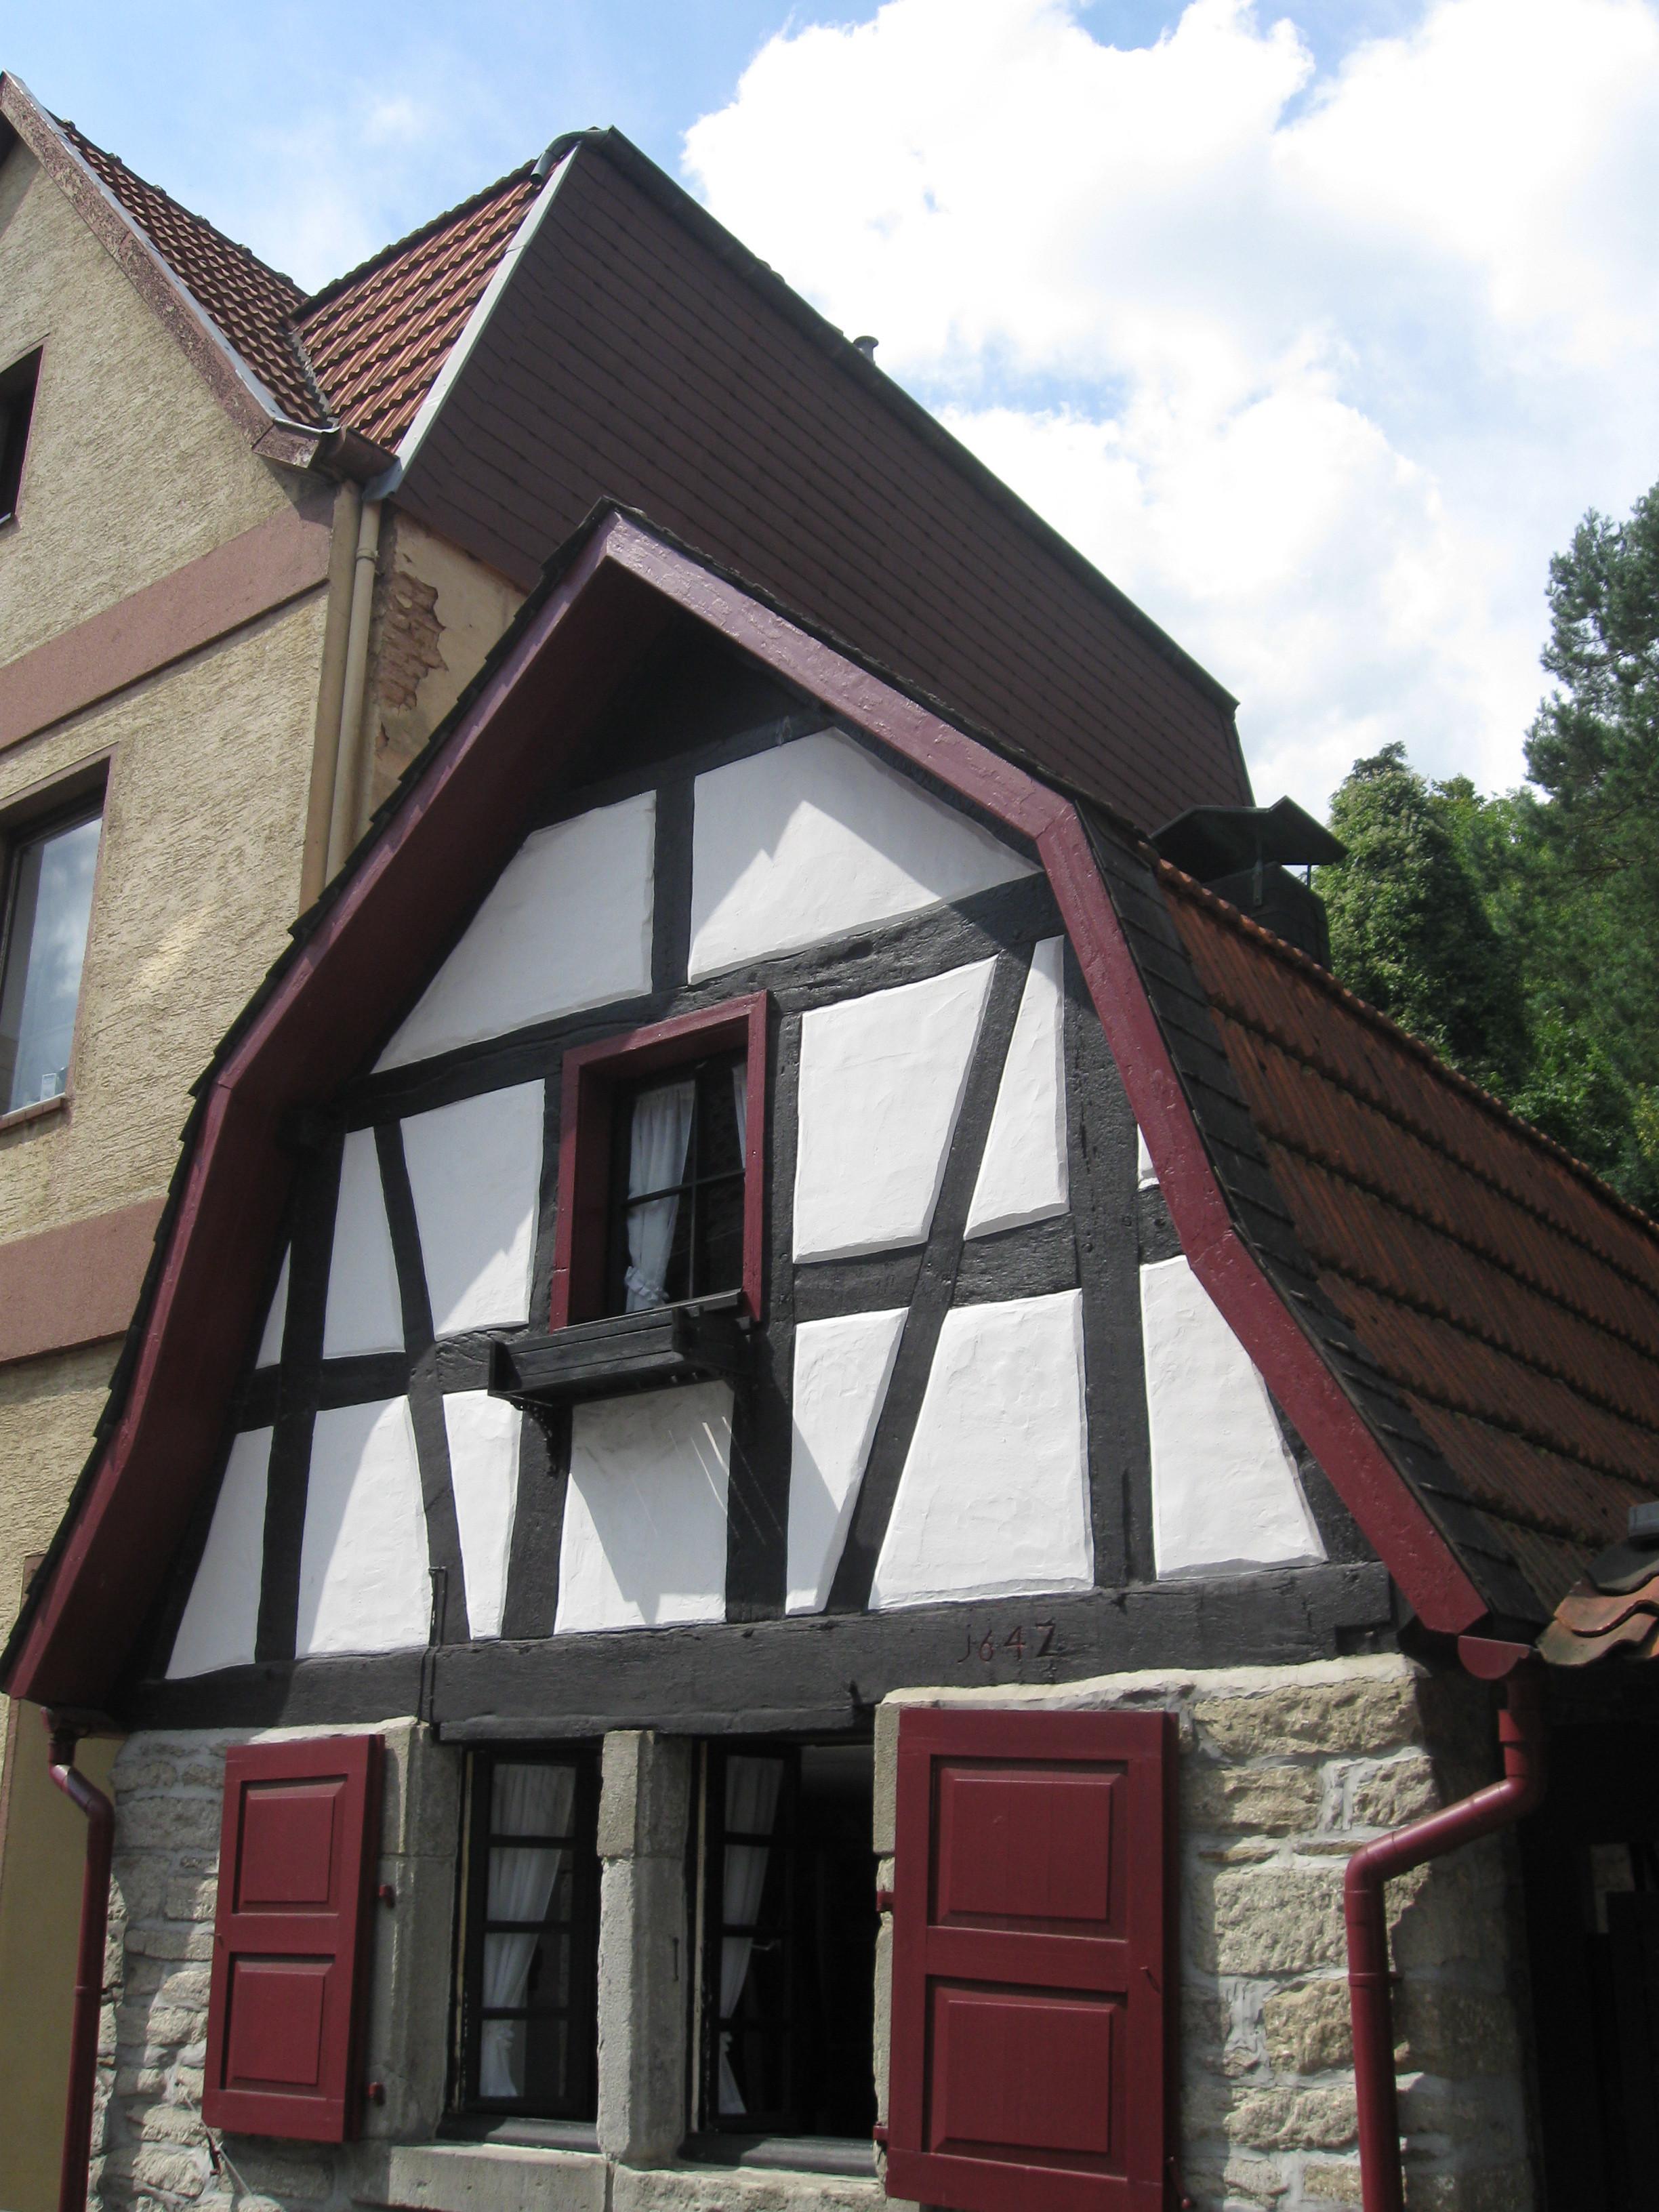 rhndorf037gzkp1.jpg